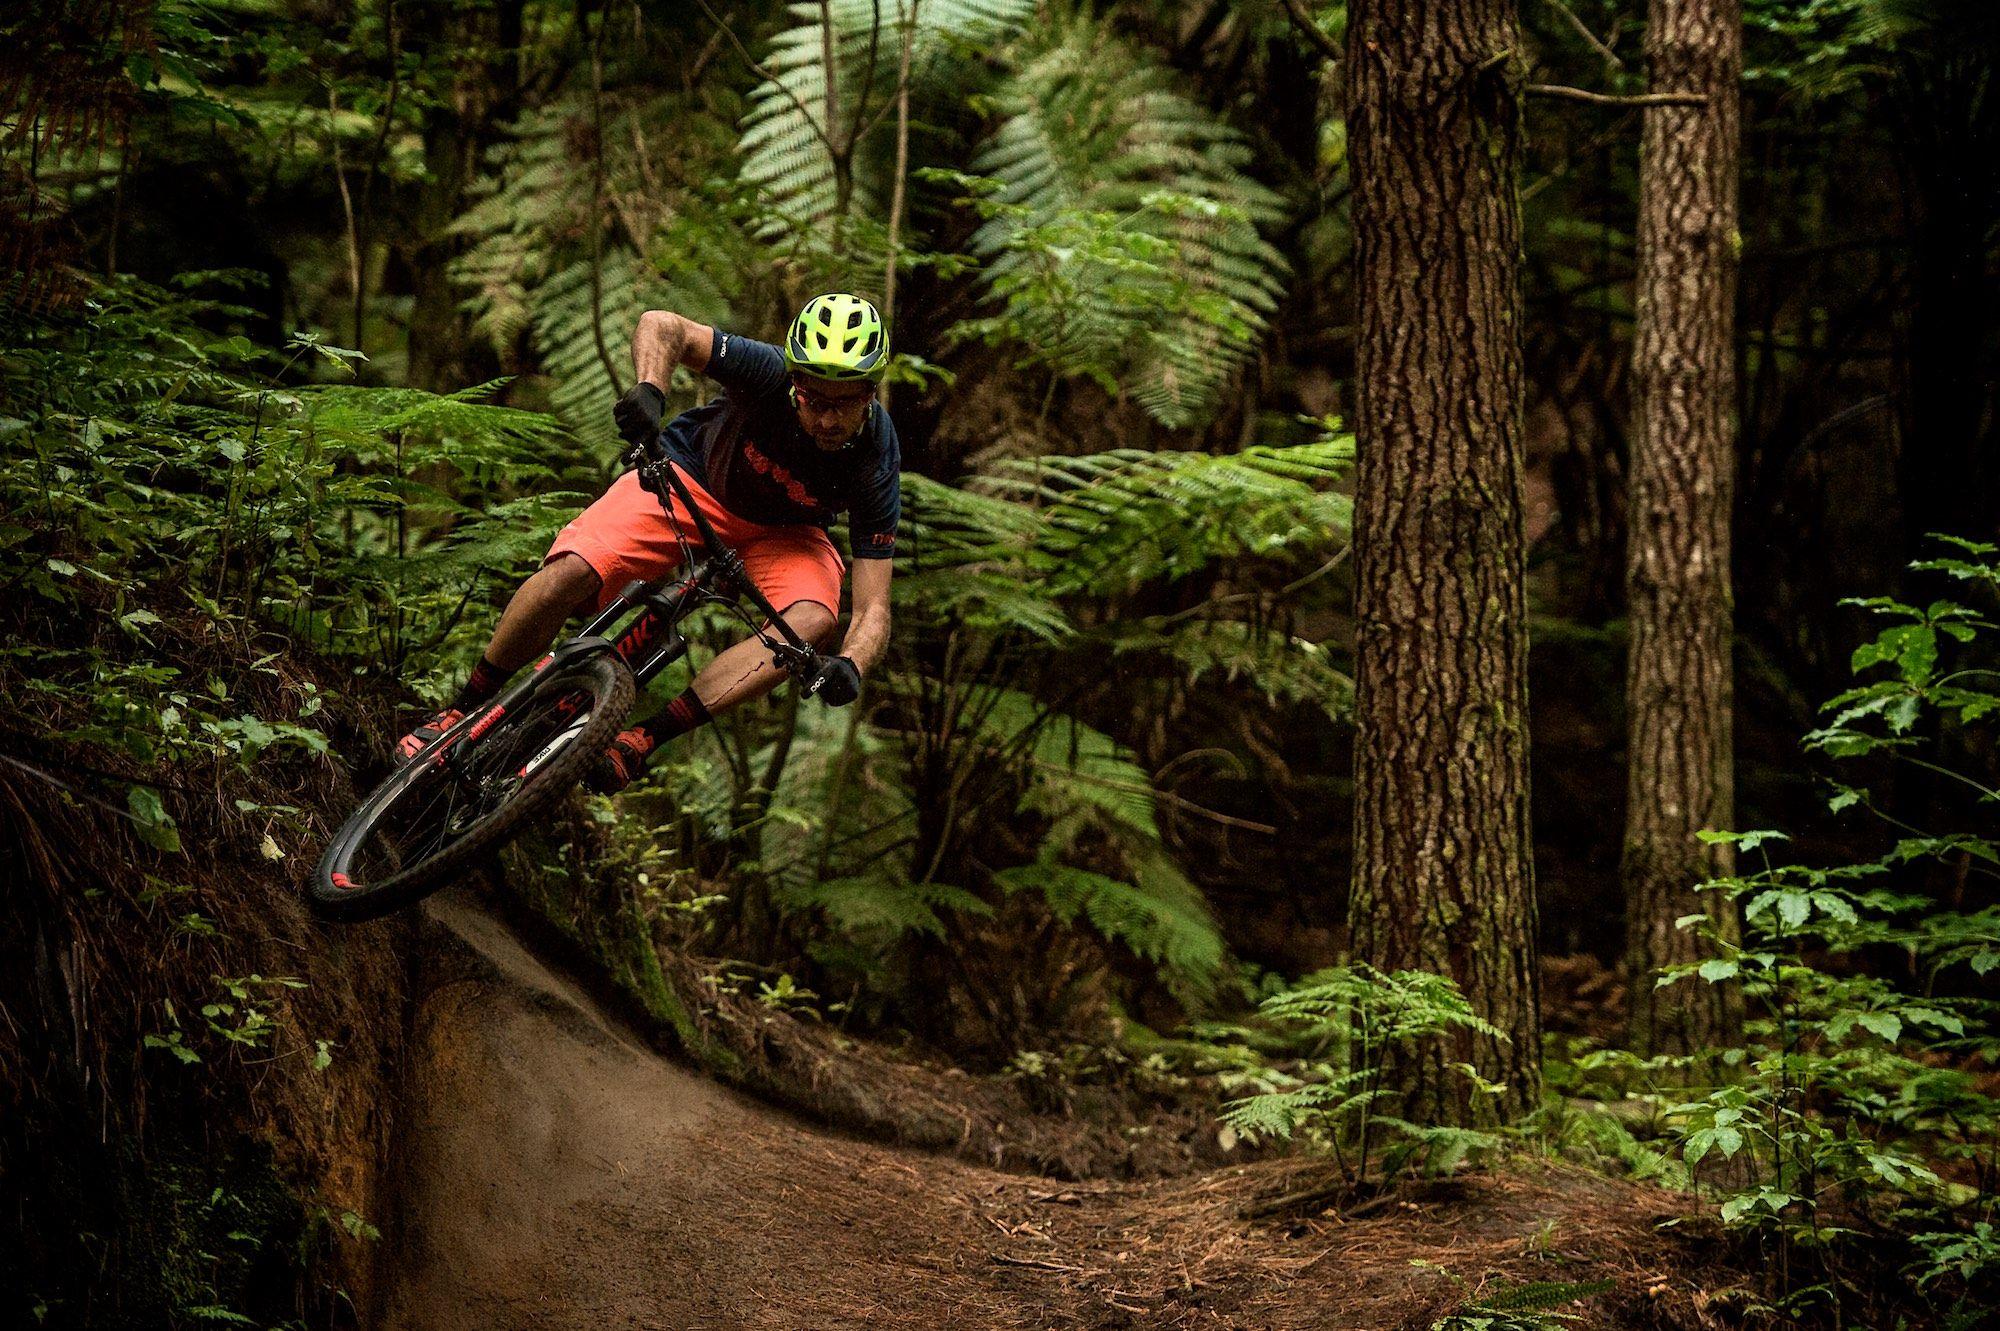 Specialized Stumpjumper Wallpaper Riding Bike Downhill